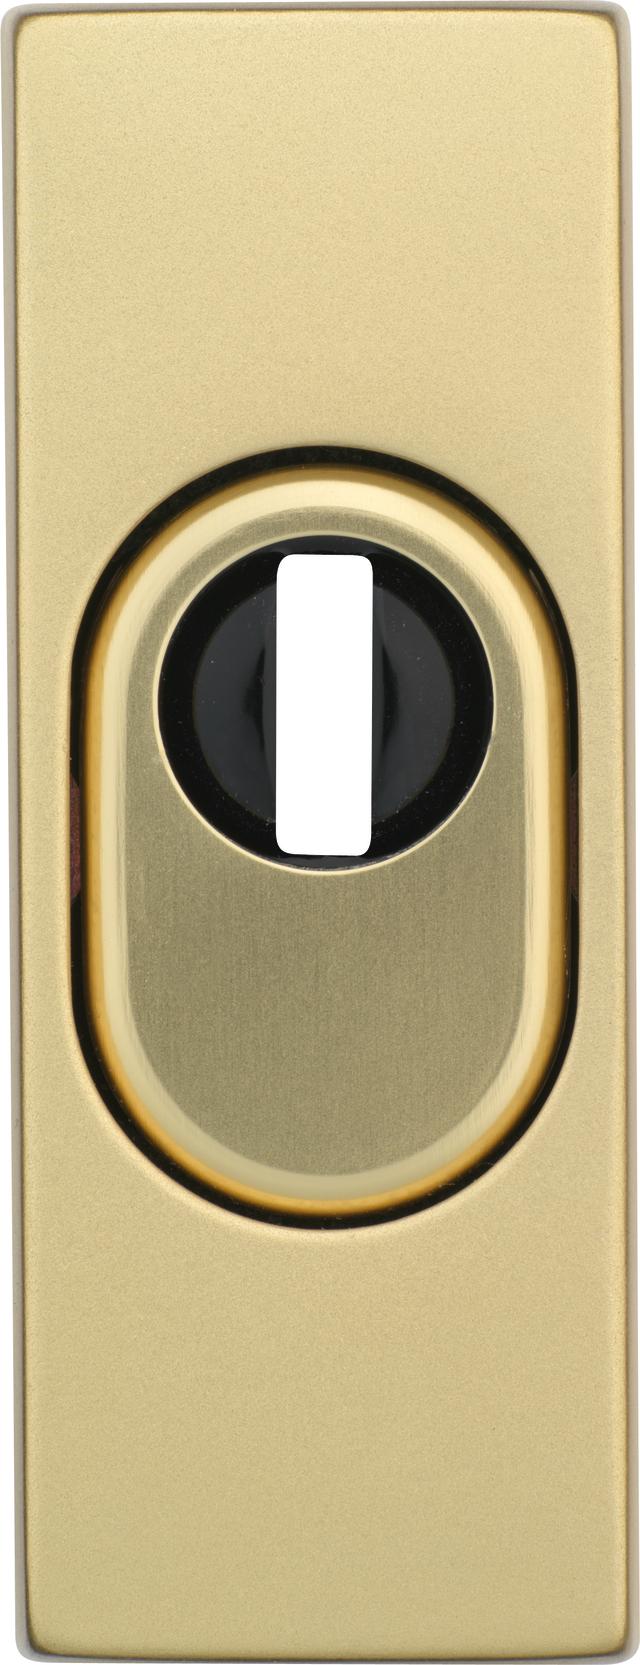 Schutzrosette RSZS316 F3 EK